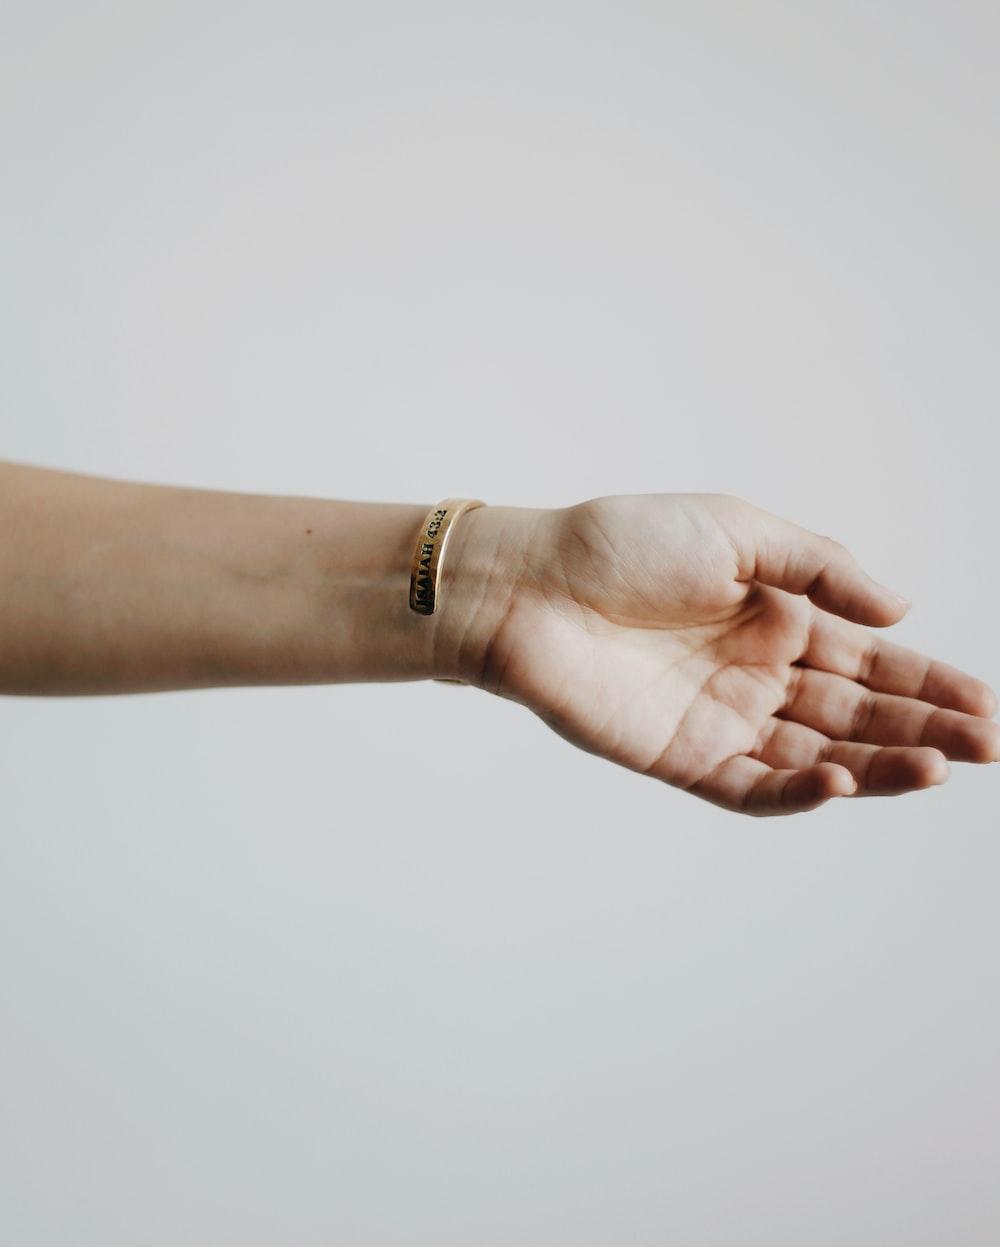 person wearing gold bracelet and gold bracelet